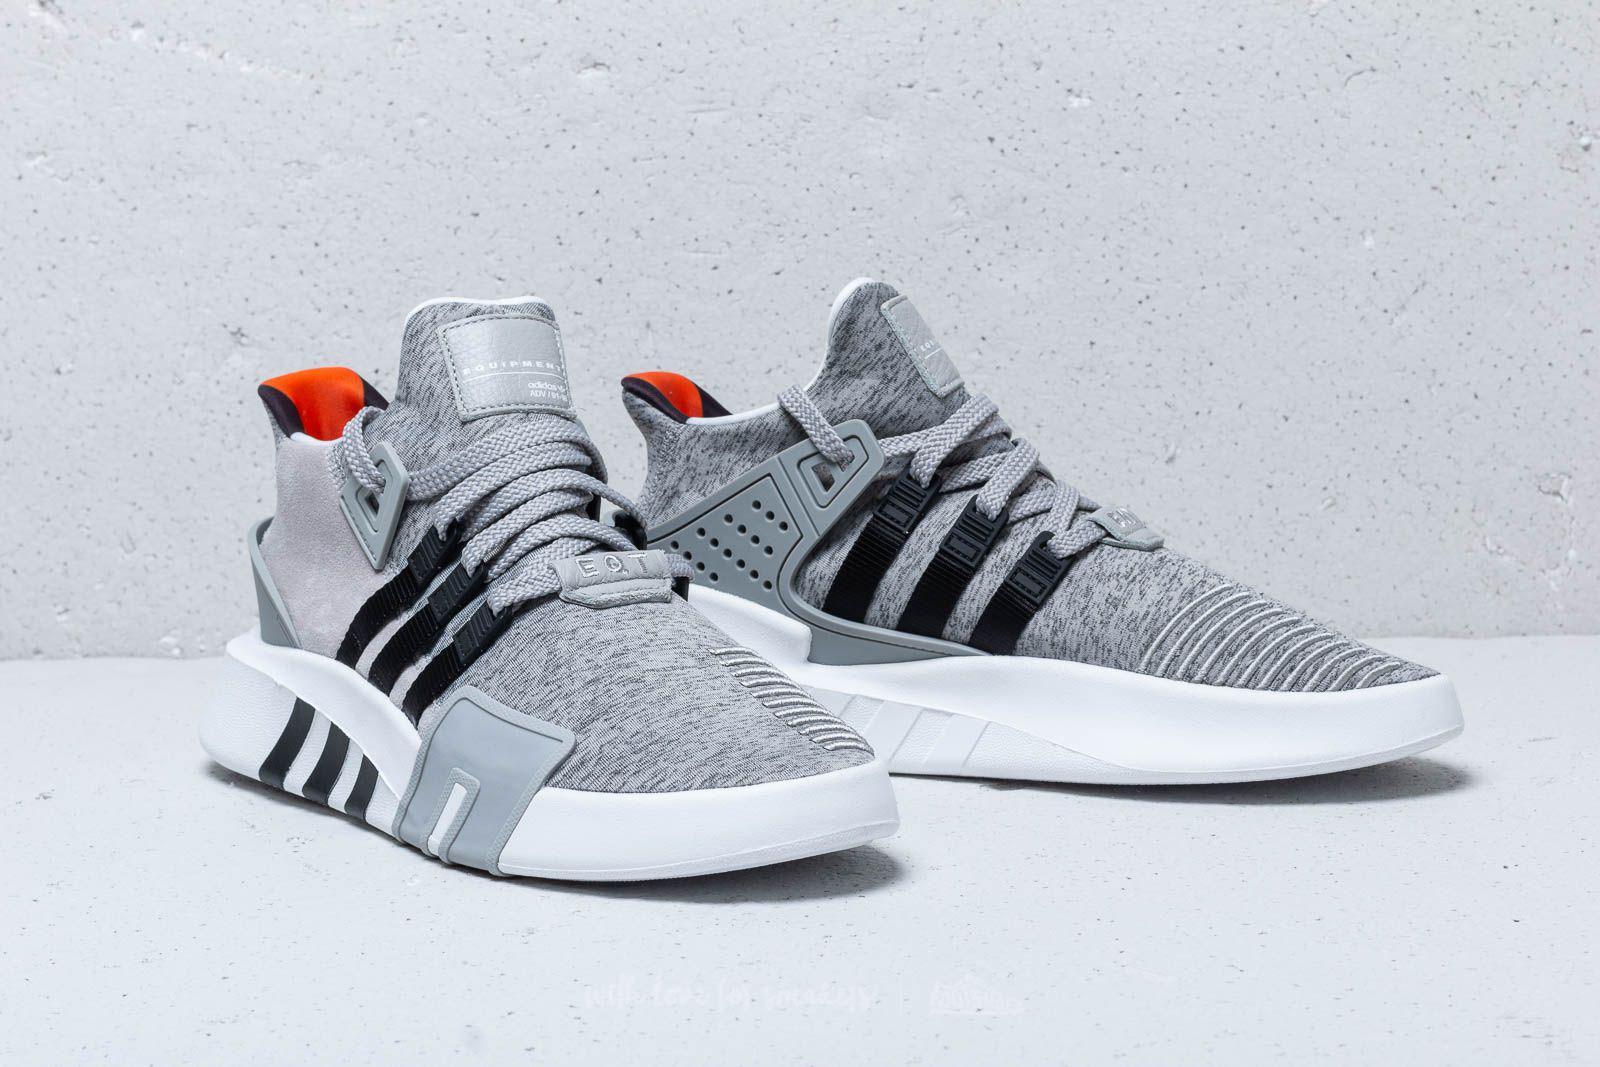 Adidas Eqt Bask Adv Grey Two/ Core Black/ Ftw White